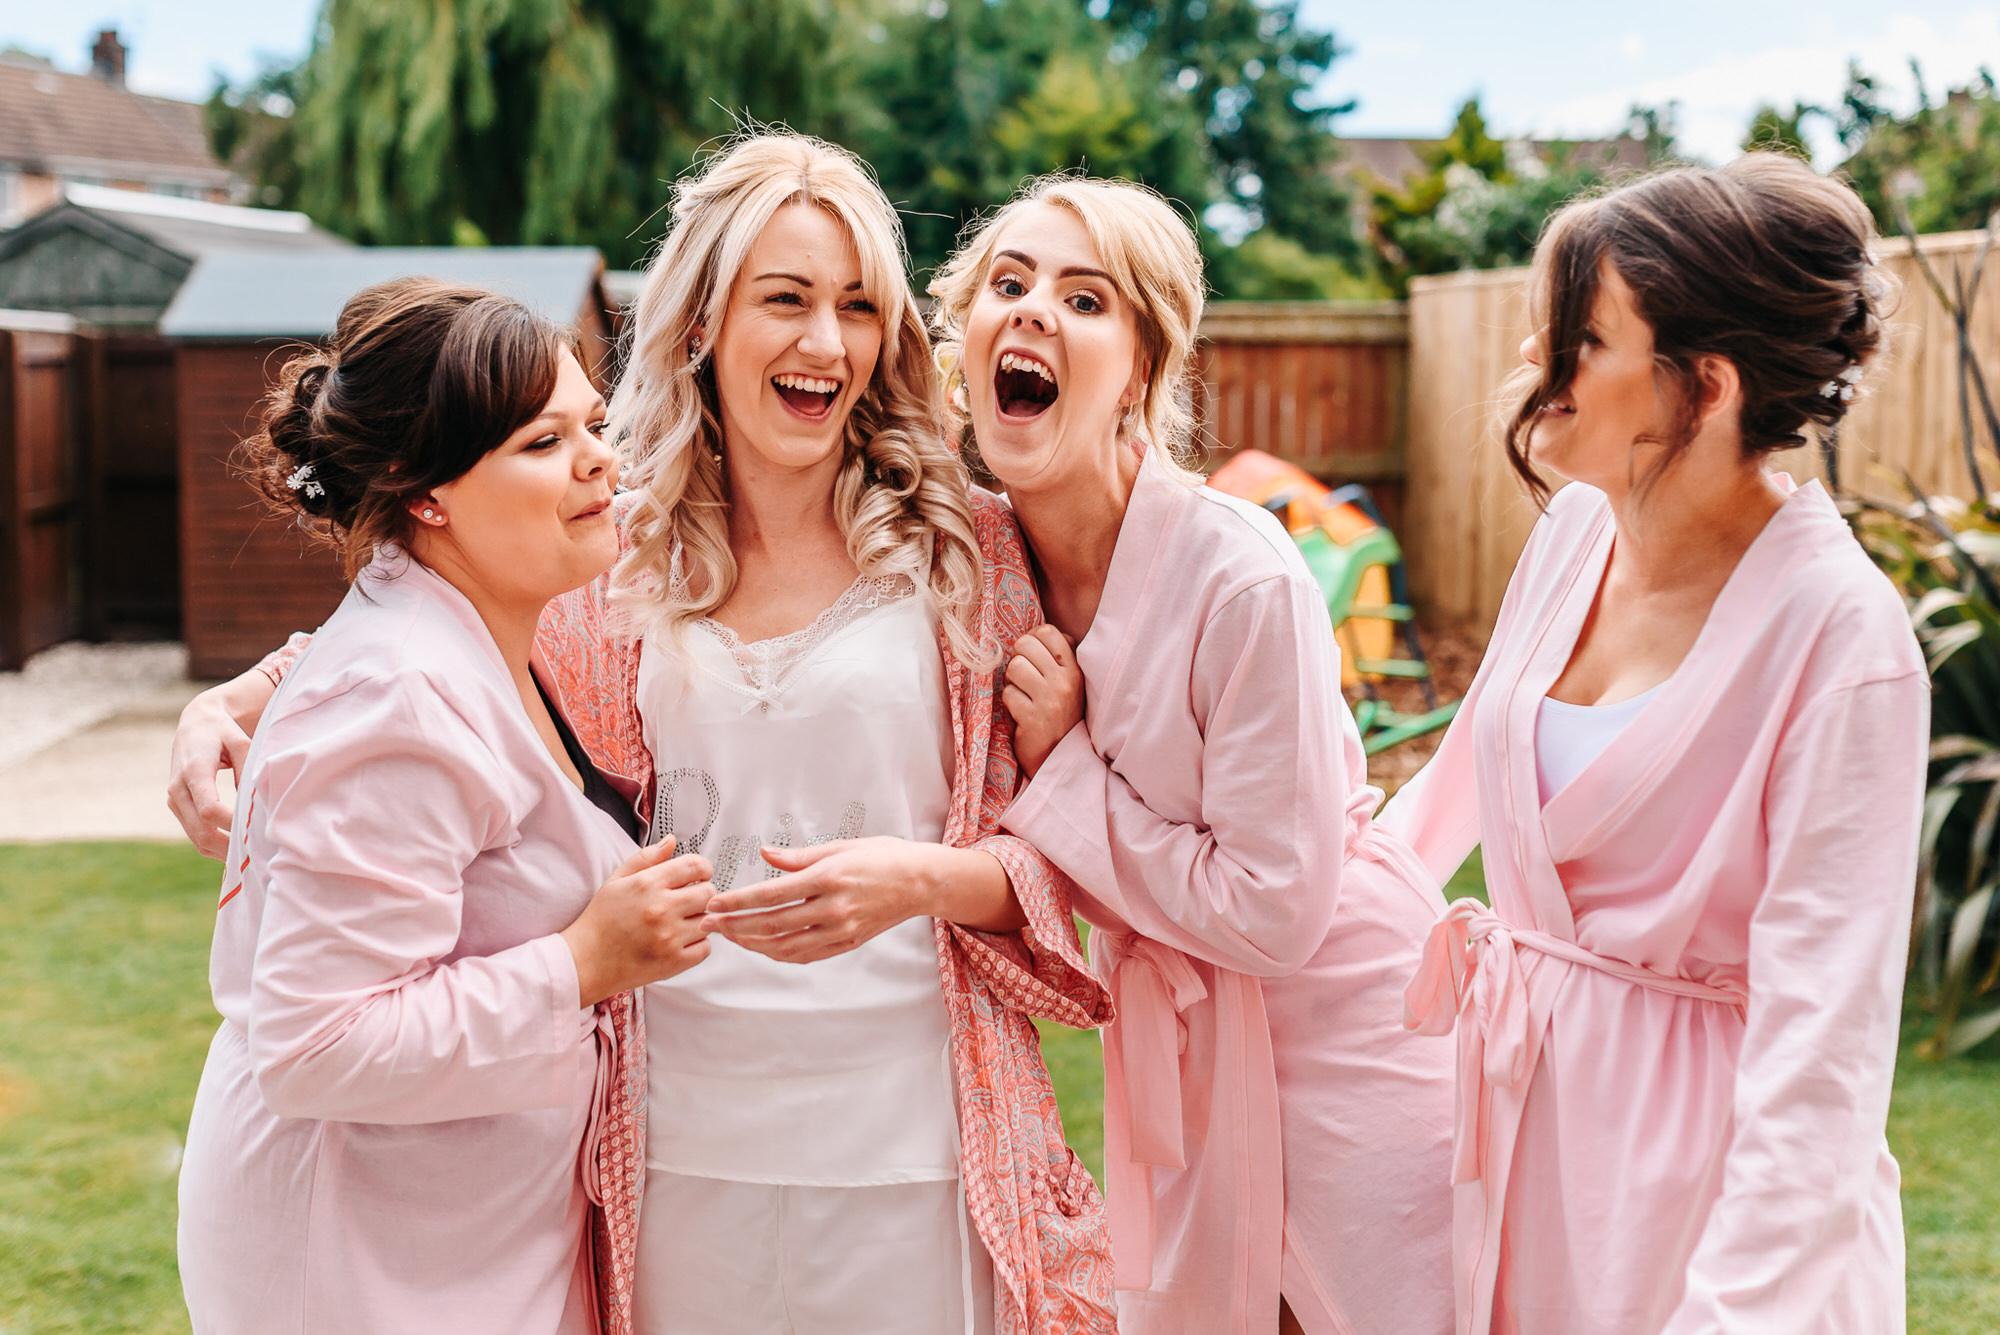 Best Of Yorkshire Wedding Photography 2017 - Martyn Hand-36.jpg